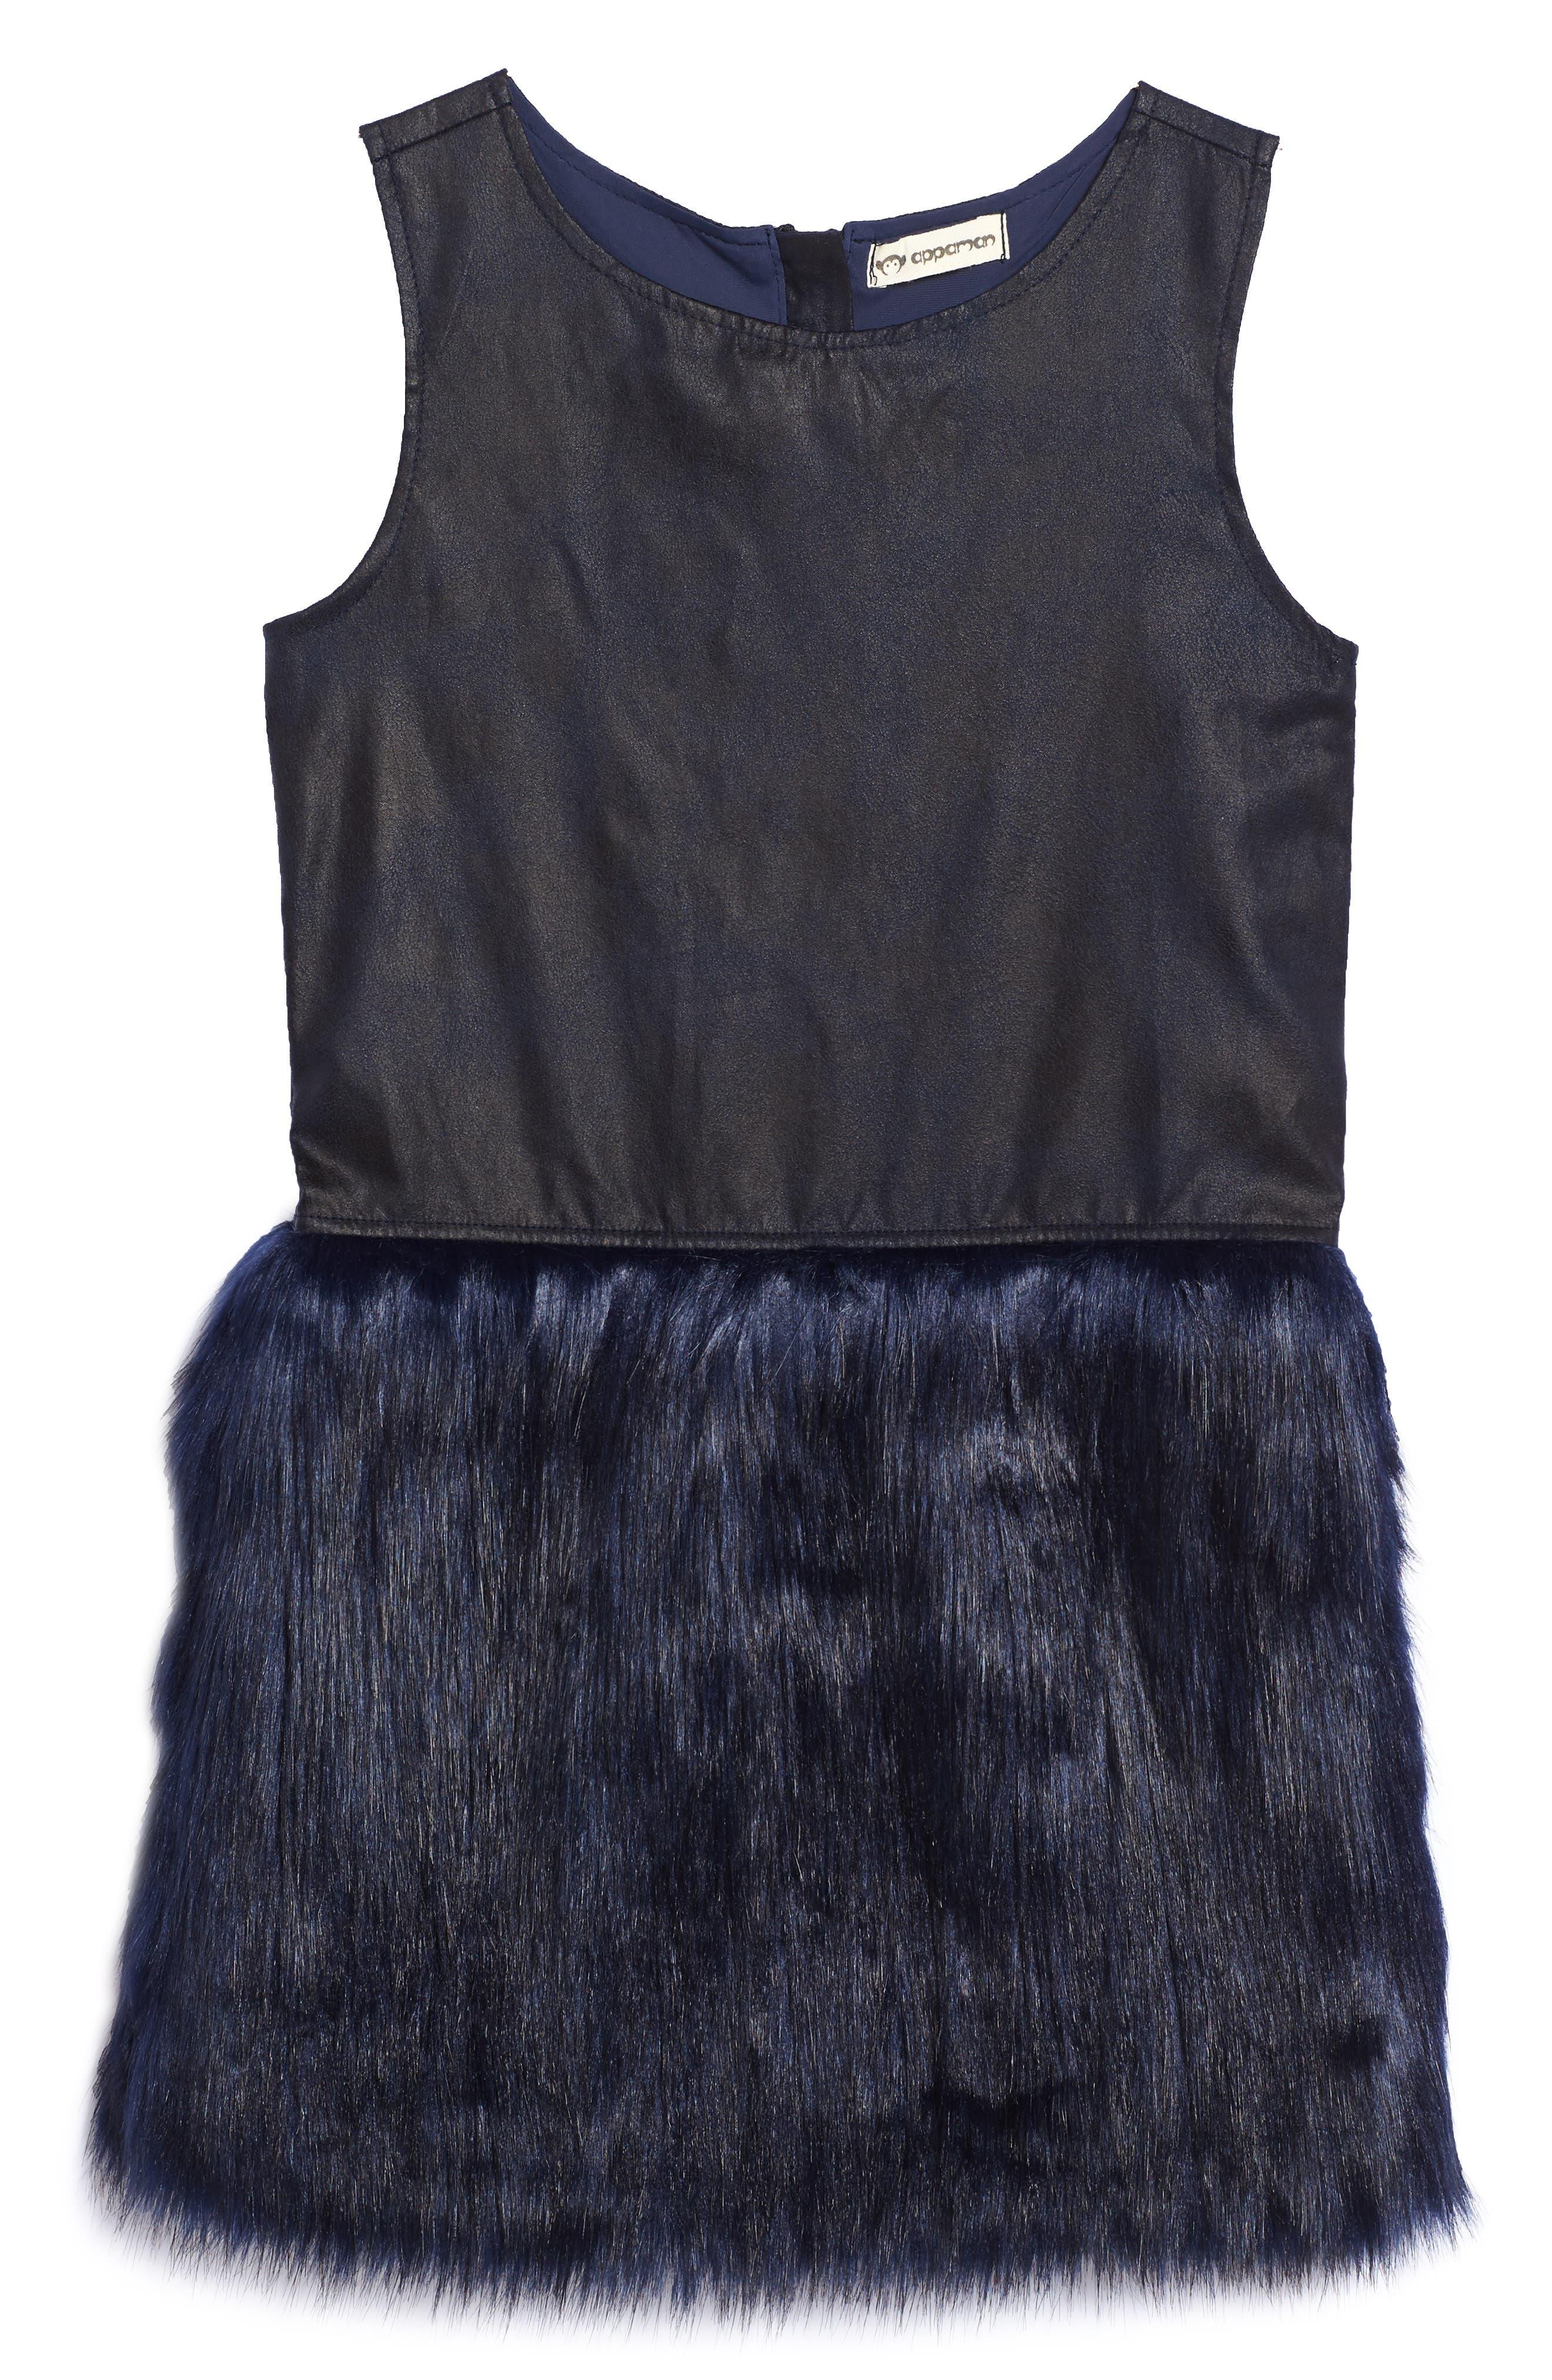 Main Image - Appaman Eve Faux Fur Dress (Toddler Girls, Little Girls & Big Girls)